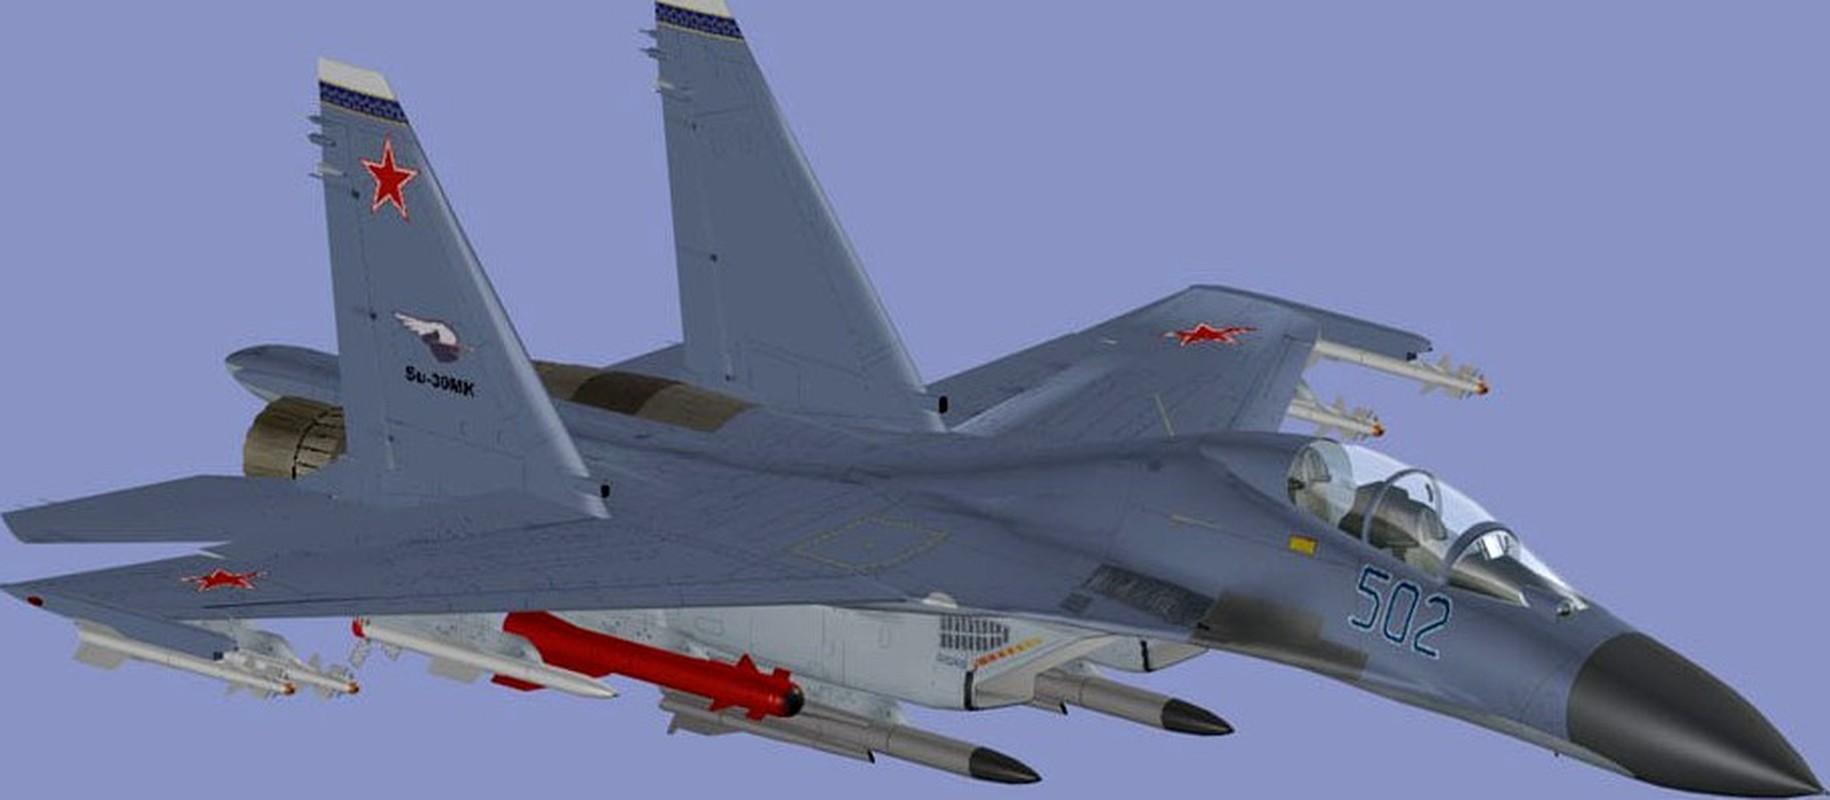 Ke ca khi giao tranh voi An Do, Trung Quoc cung khong dung J-20-Hinh-11